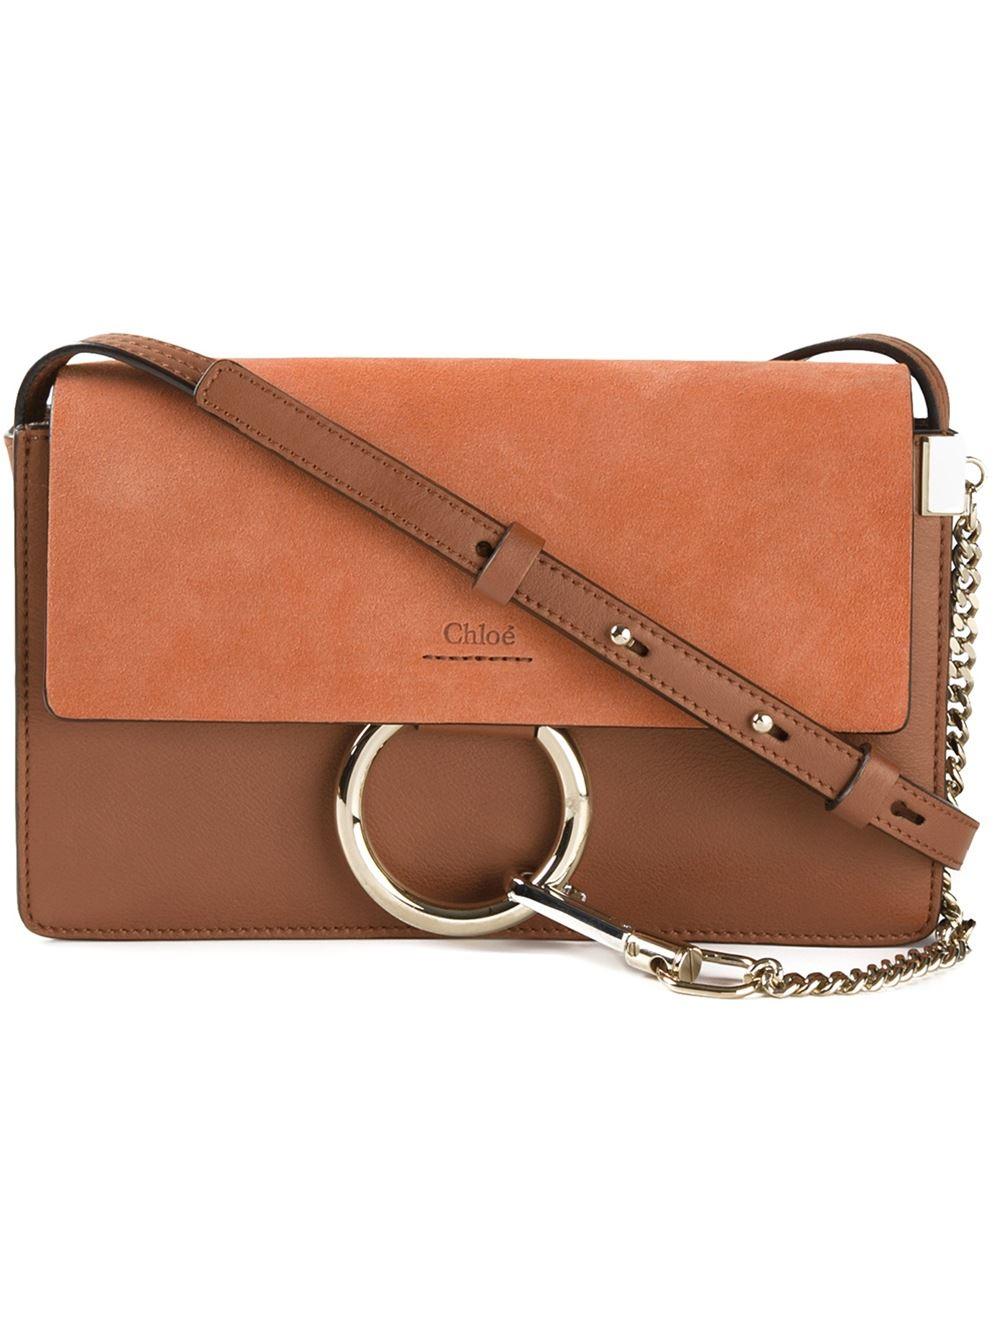 Chloe Faye Shoulder Bag Reference Guide | Spotted Fashion